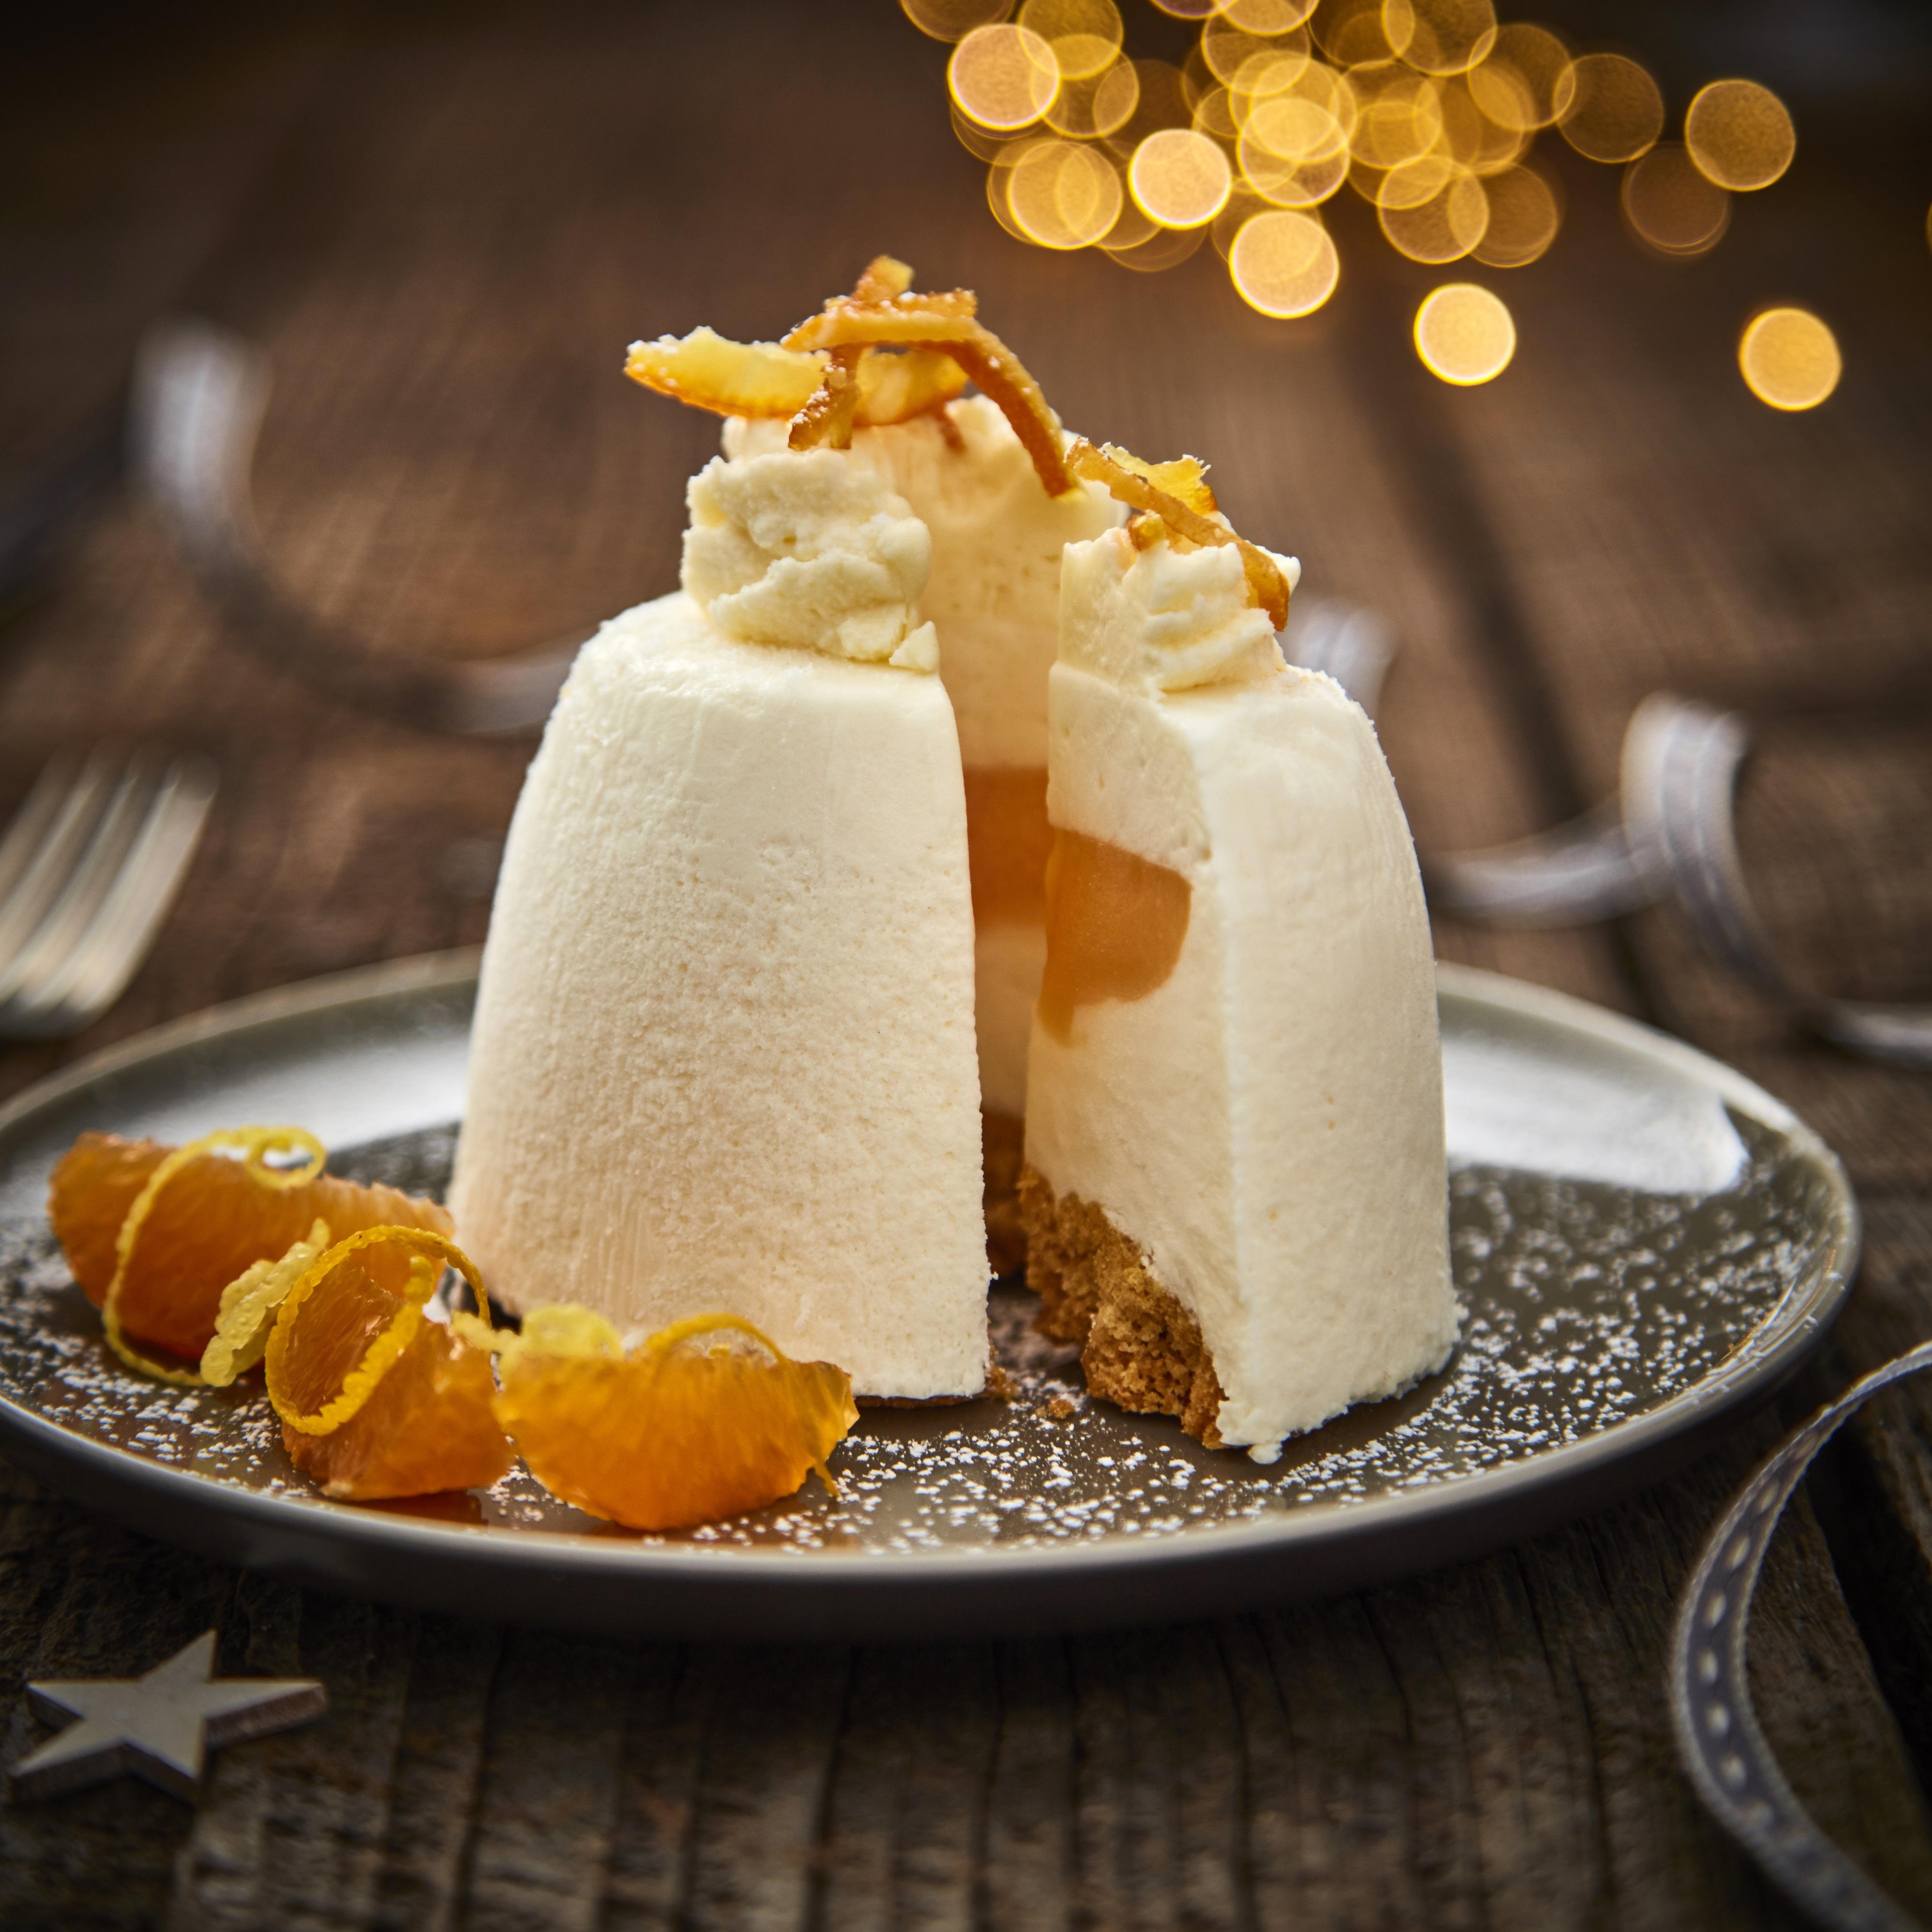 Christmas Desserts Uk.Country Range Adds Three New Christmas Desserts Bfff